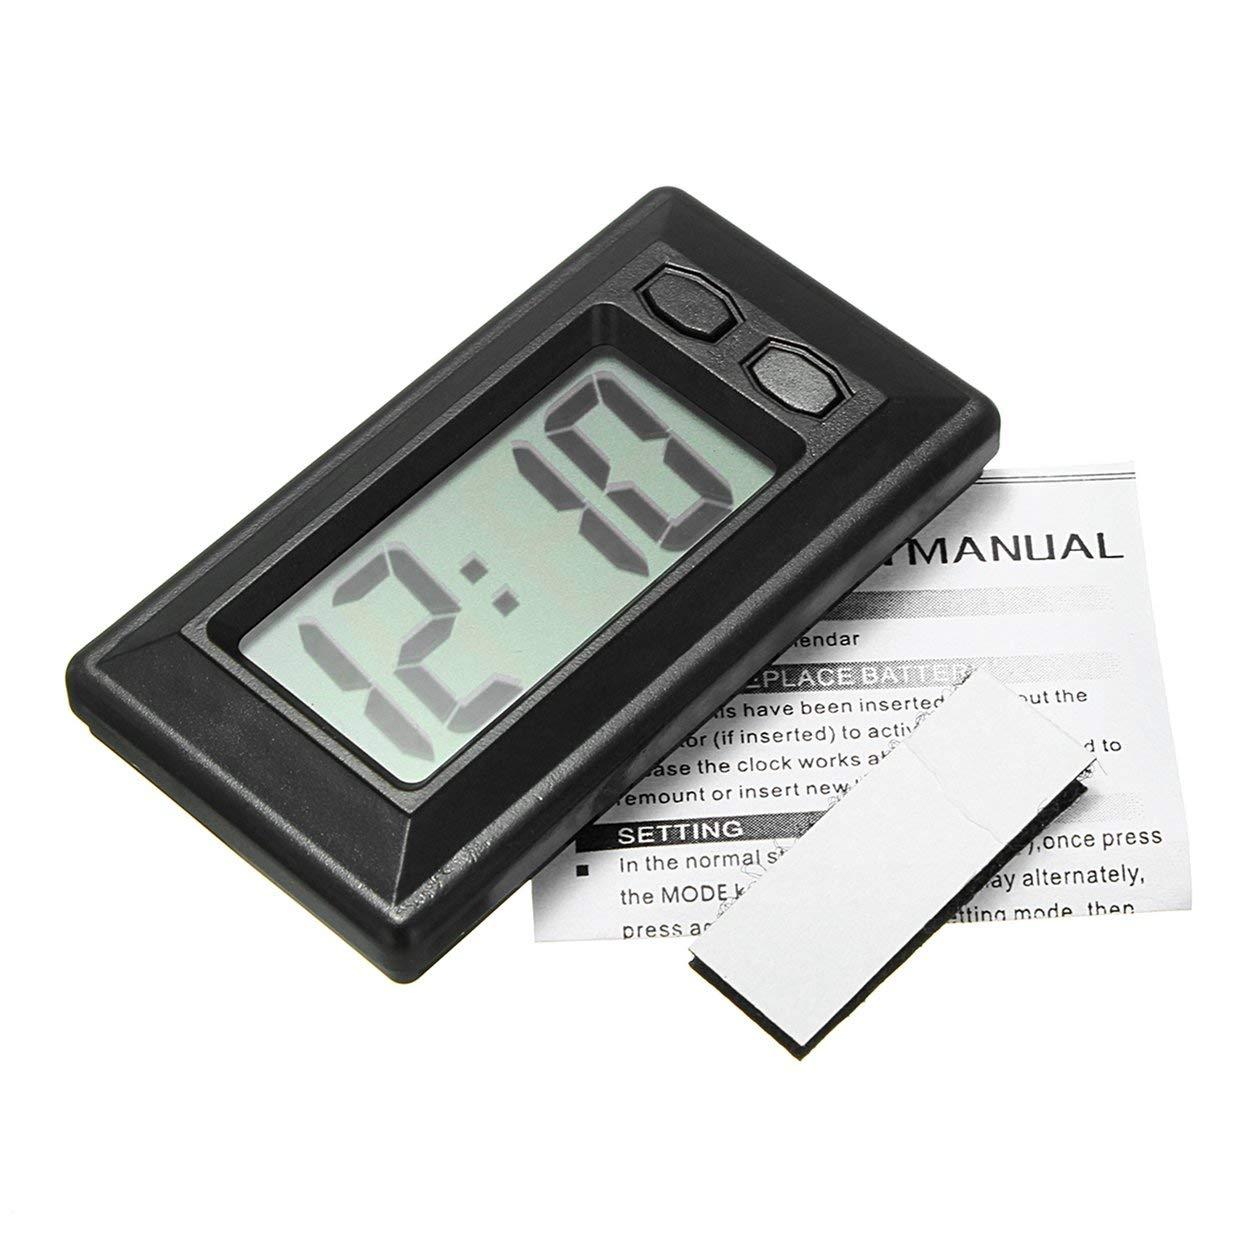 Auto-Armaturenbrett-Uhr, ultradü nn, LCD-Digitalanzeige, Auto-Digitaluhr, Armaturenbrett-Uhr mit Kalenderanzeige, tragbares Mini-Zubehö r LoveOlvido